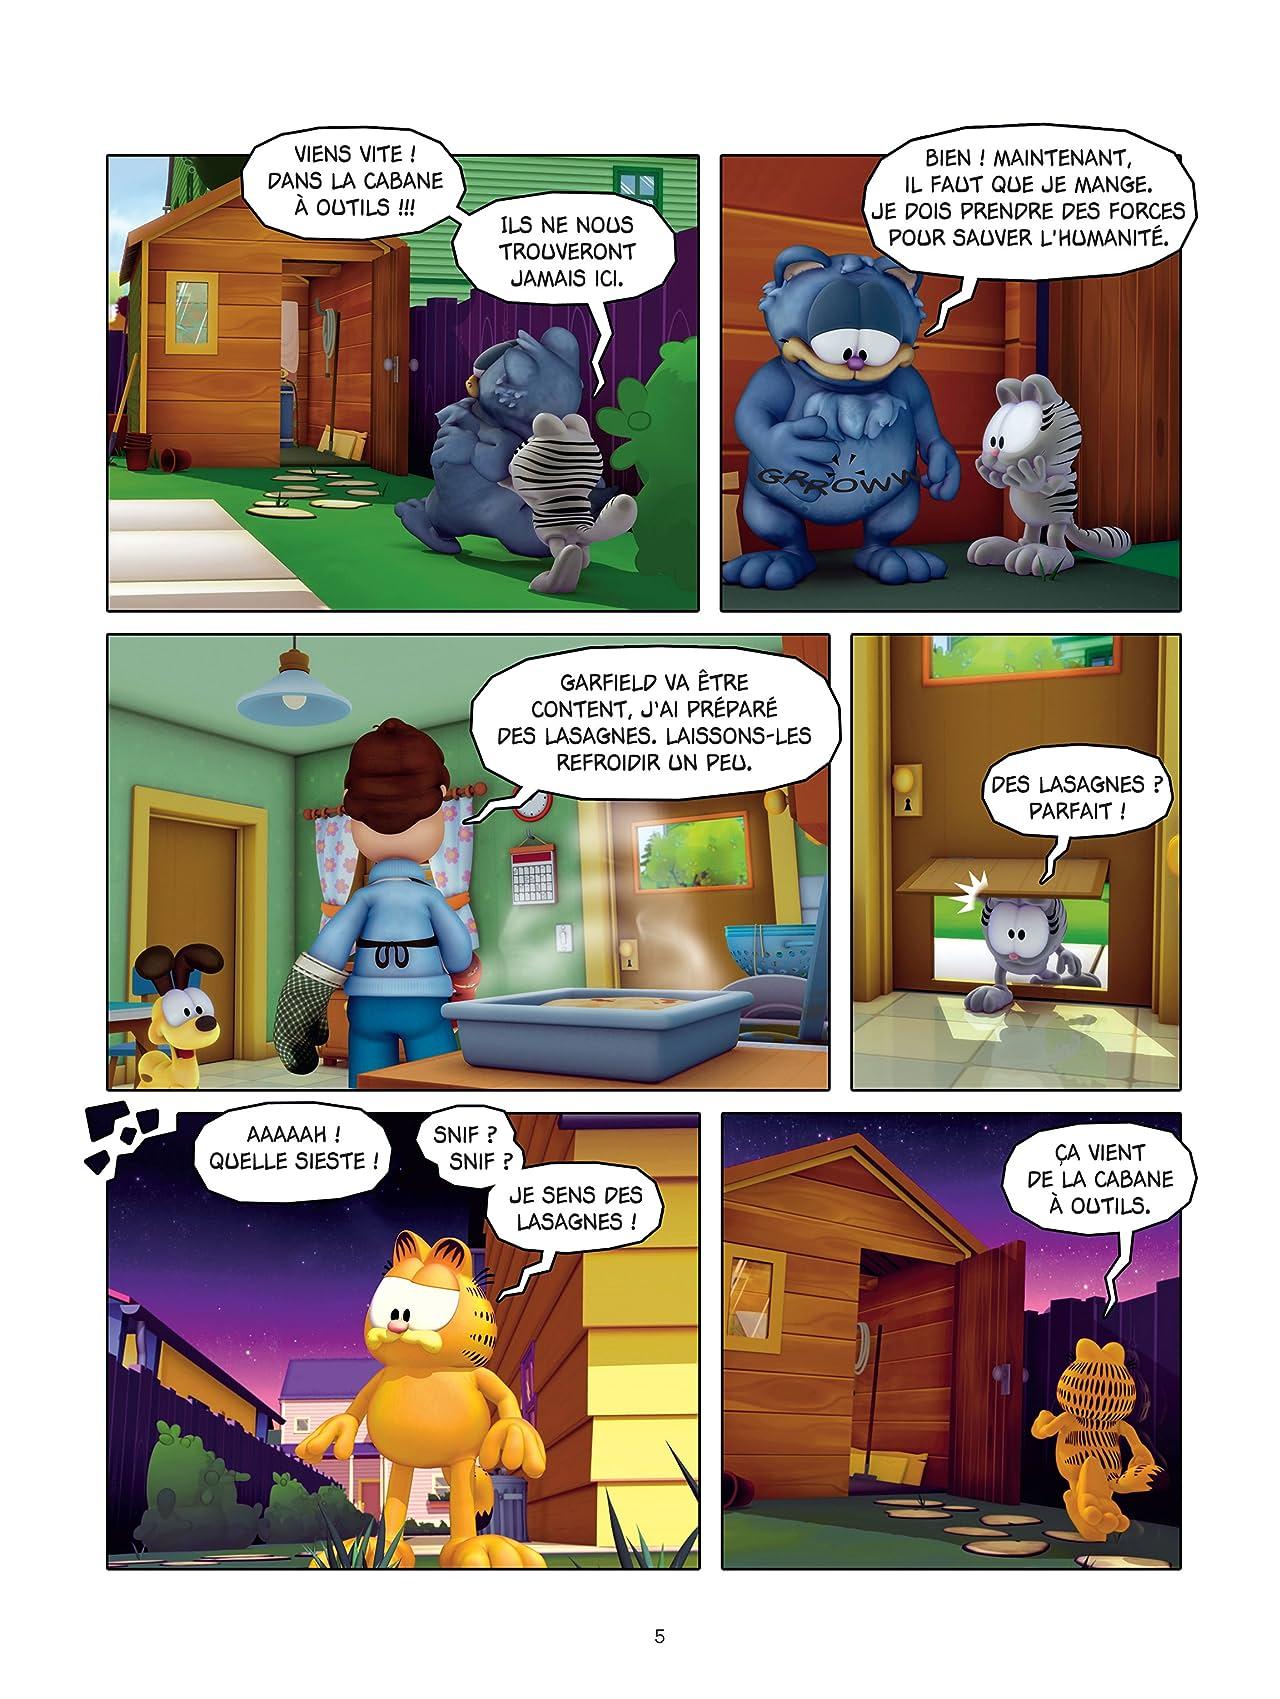 Garfield et Cie Vol. 8: Agent secret